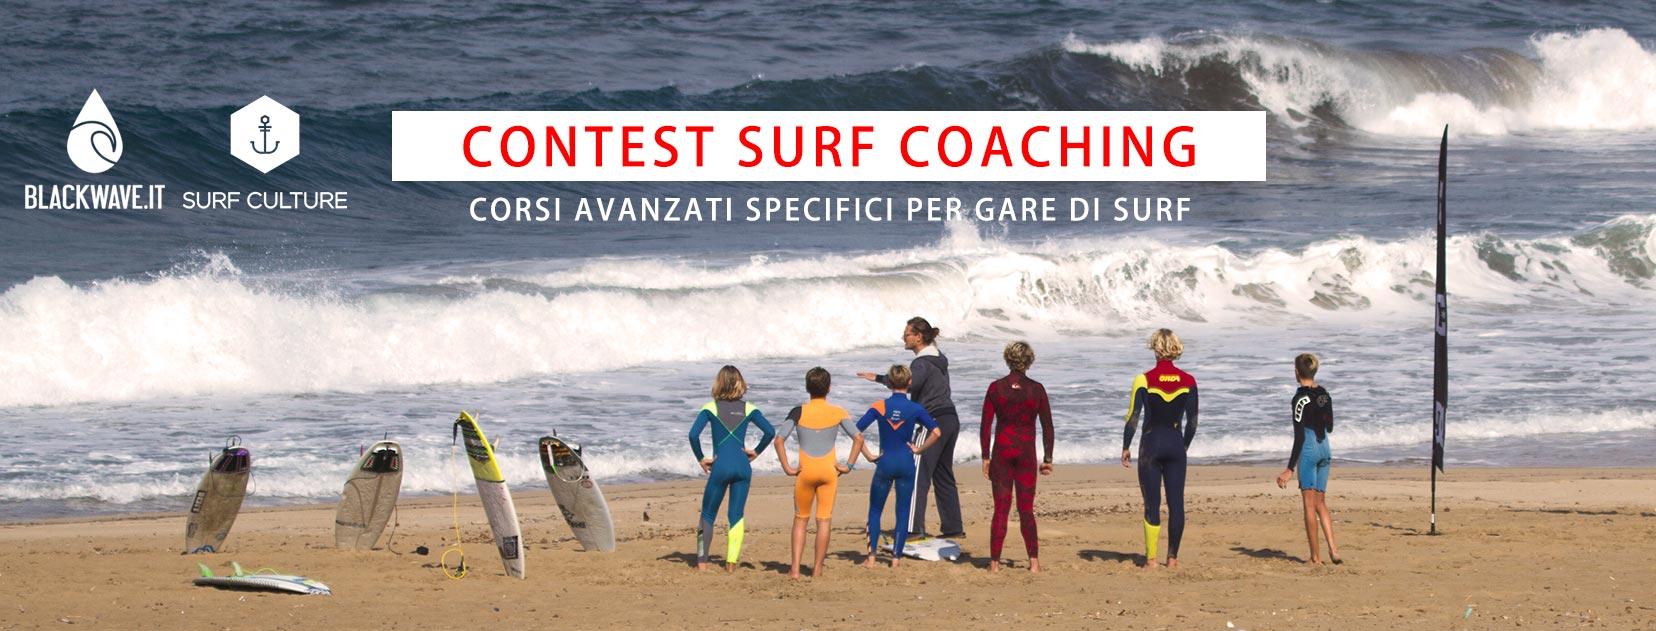 contest_surf_coaching_nicola_bresciani